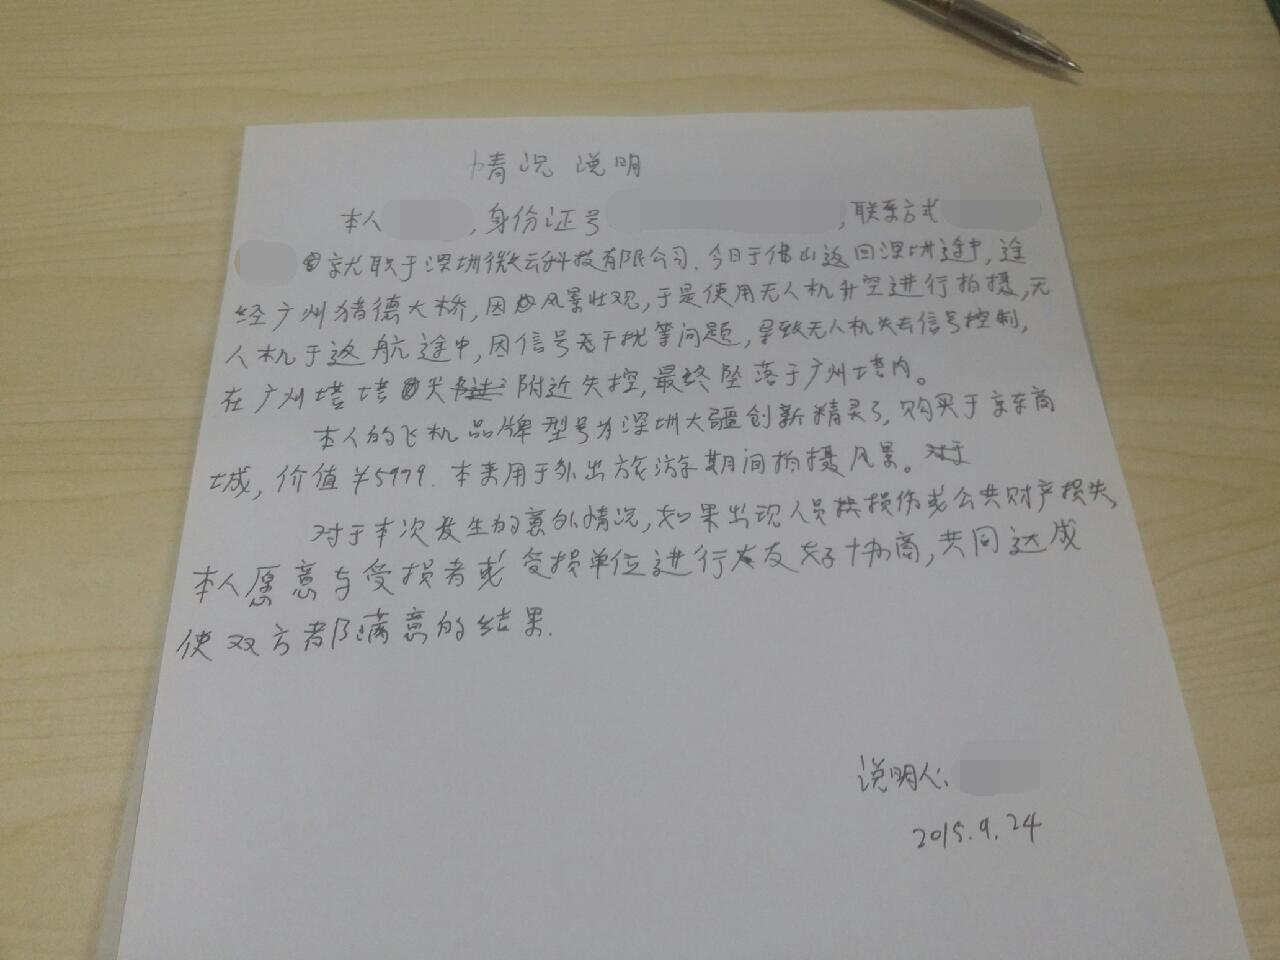 1443145765739_4a6bc8dc-a59a-4d04-bfc8-c8b9cfbc5abc_by_filter_看图王.jpg